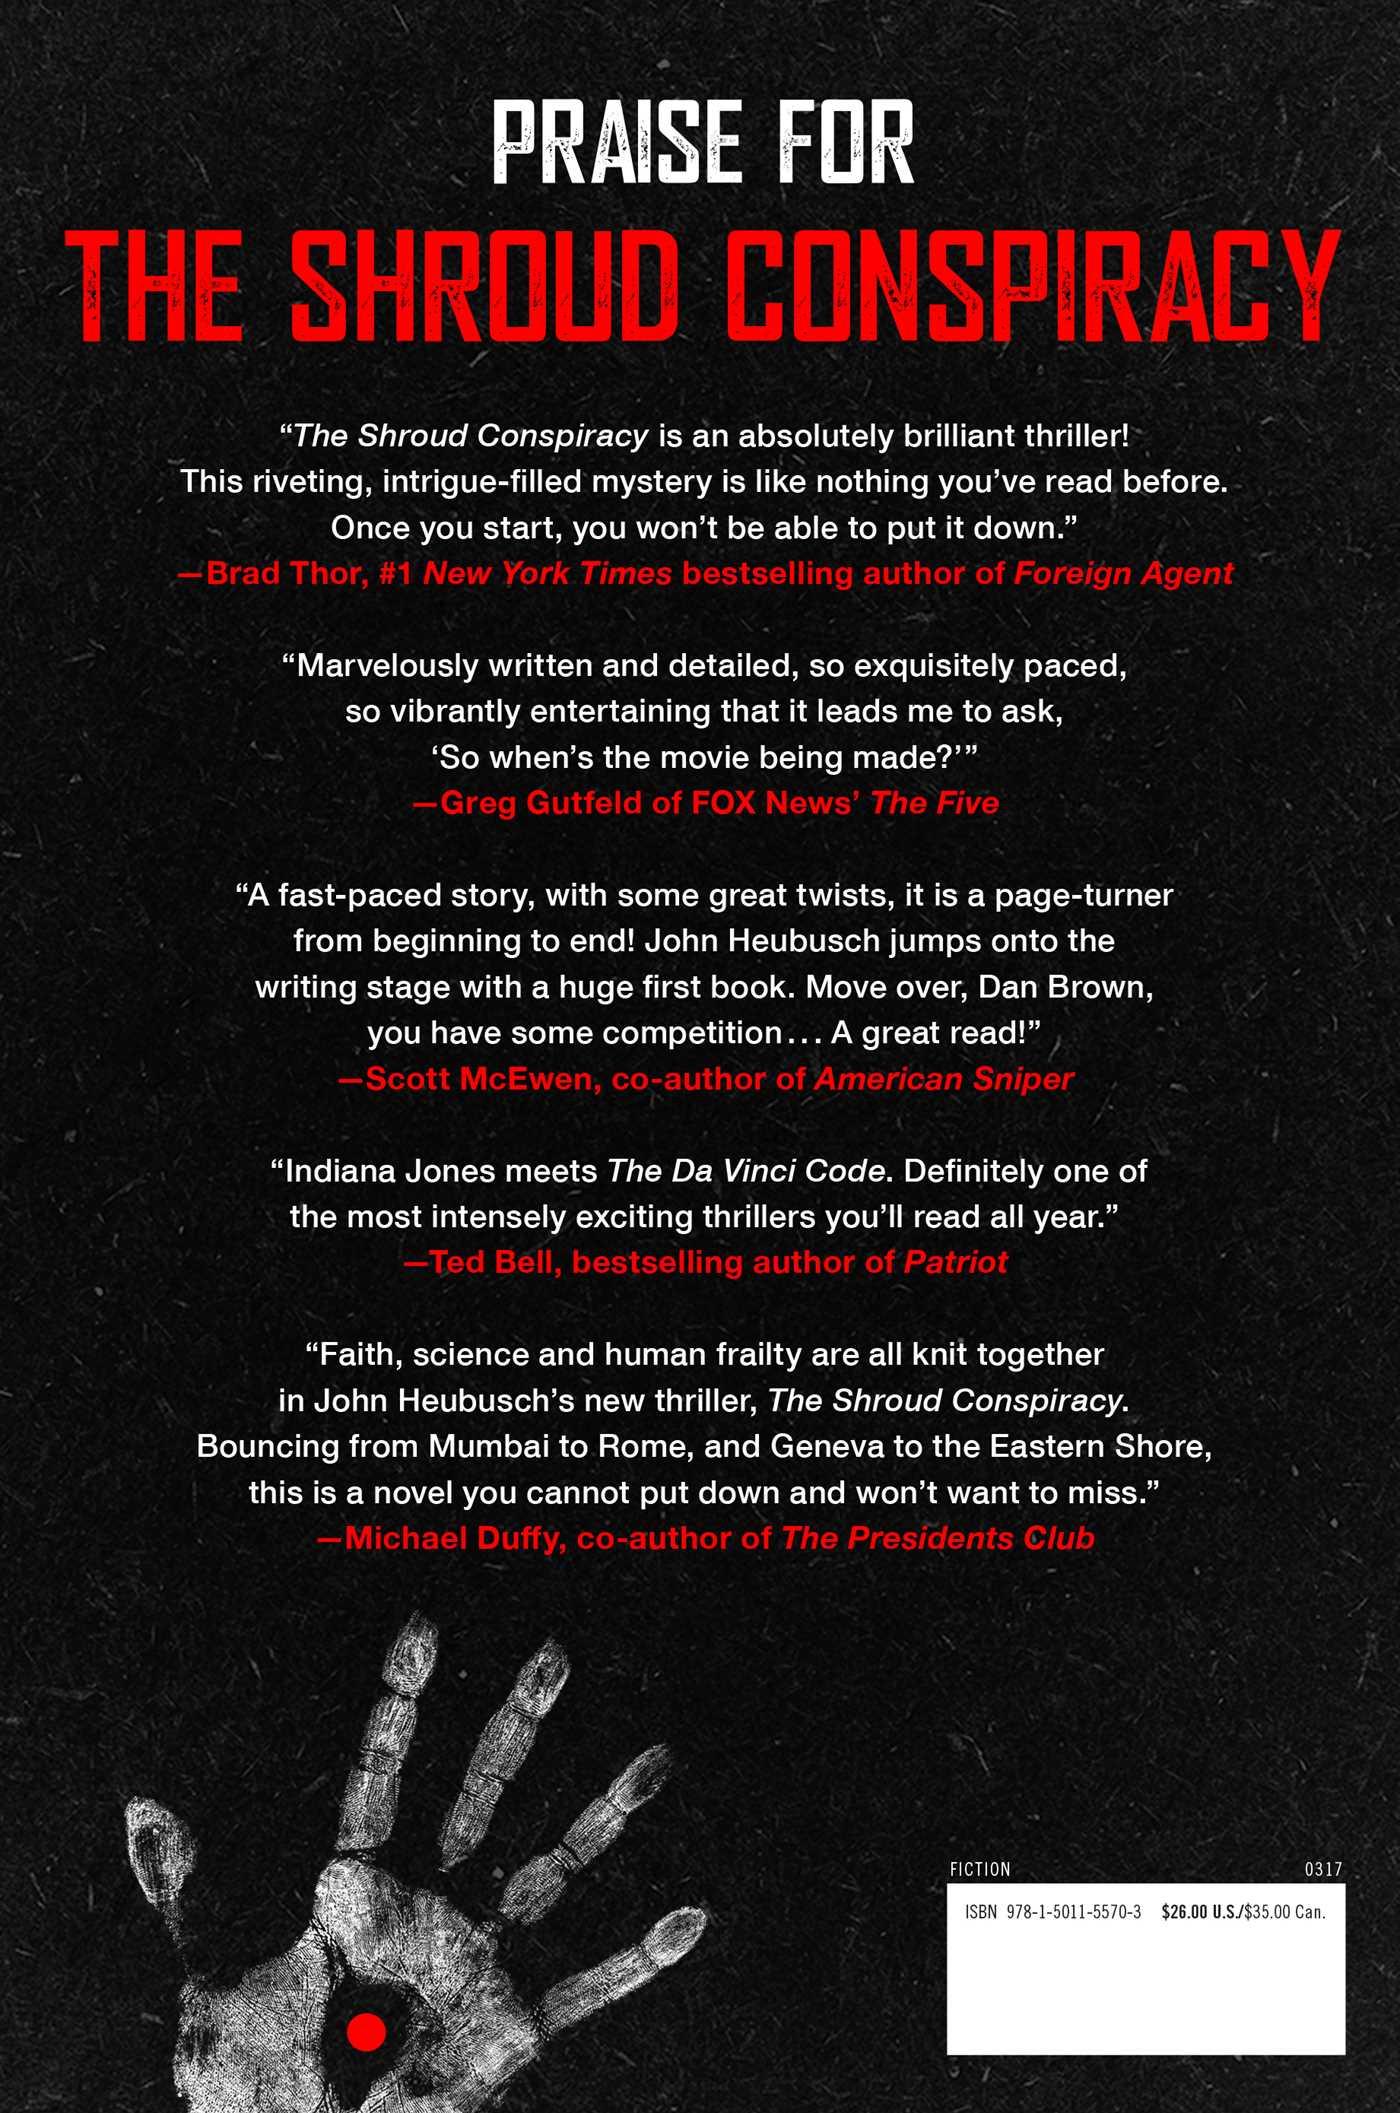 The shroud conspiracy 9781501155703 hr back